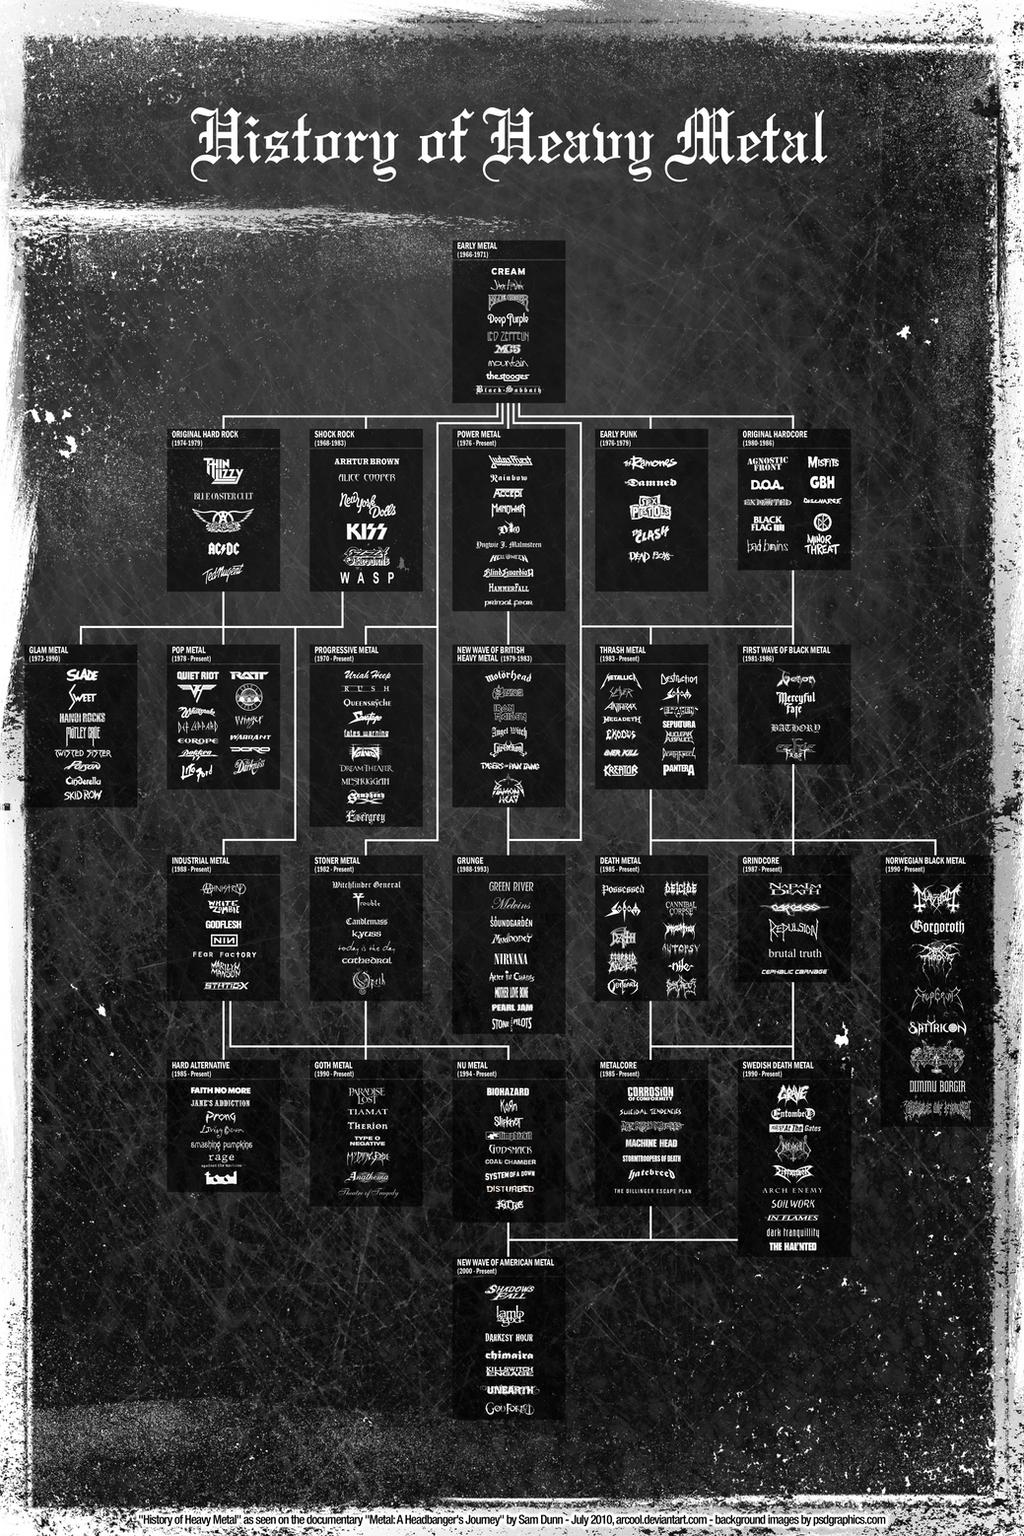 History of heavy metal by arcool on deviantart history of heavy metal full resolution by arcool gamestrikefo Gallery